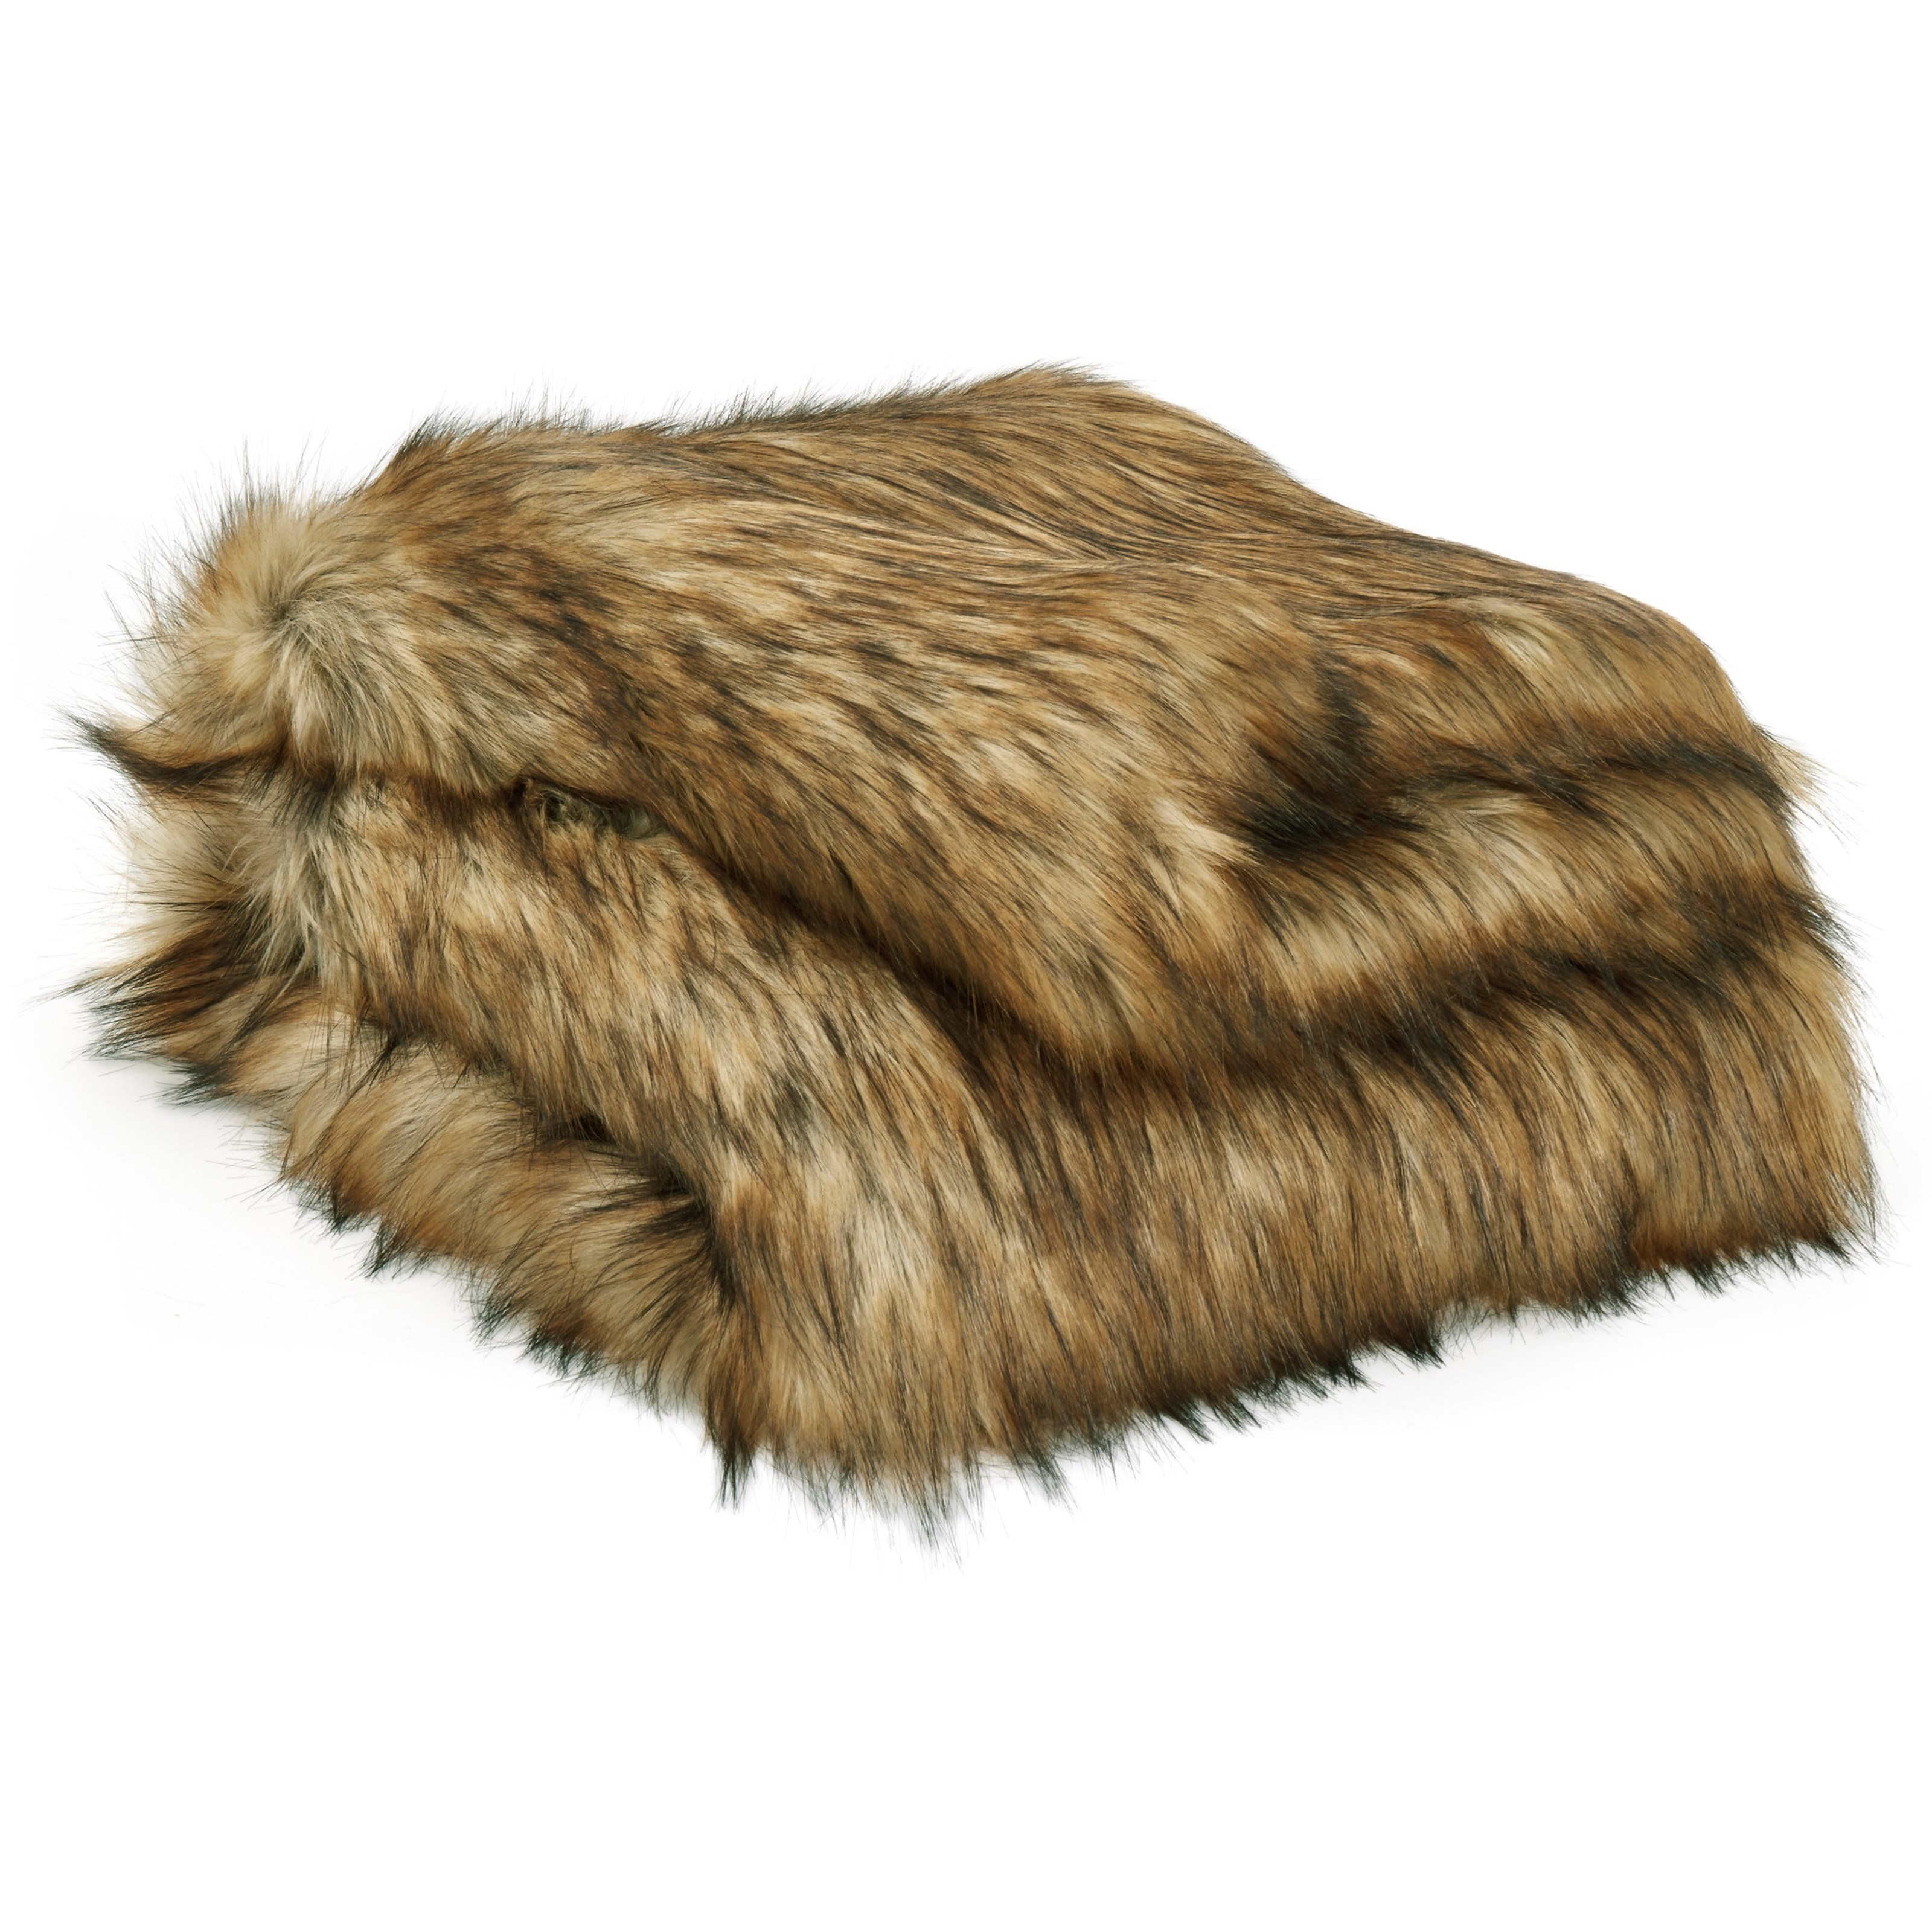 Throws Milton Brown/Black Faux Fur Throw by Ashley (Signature Design) at Johnny Janosik